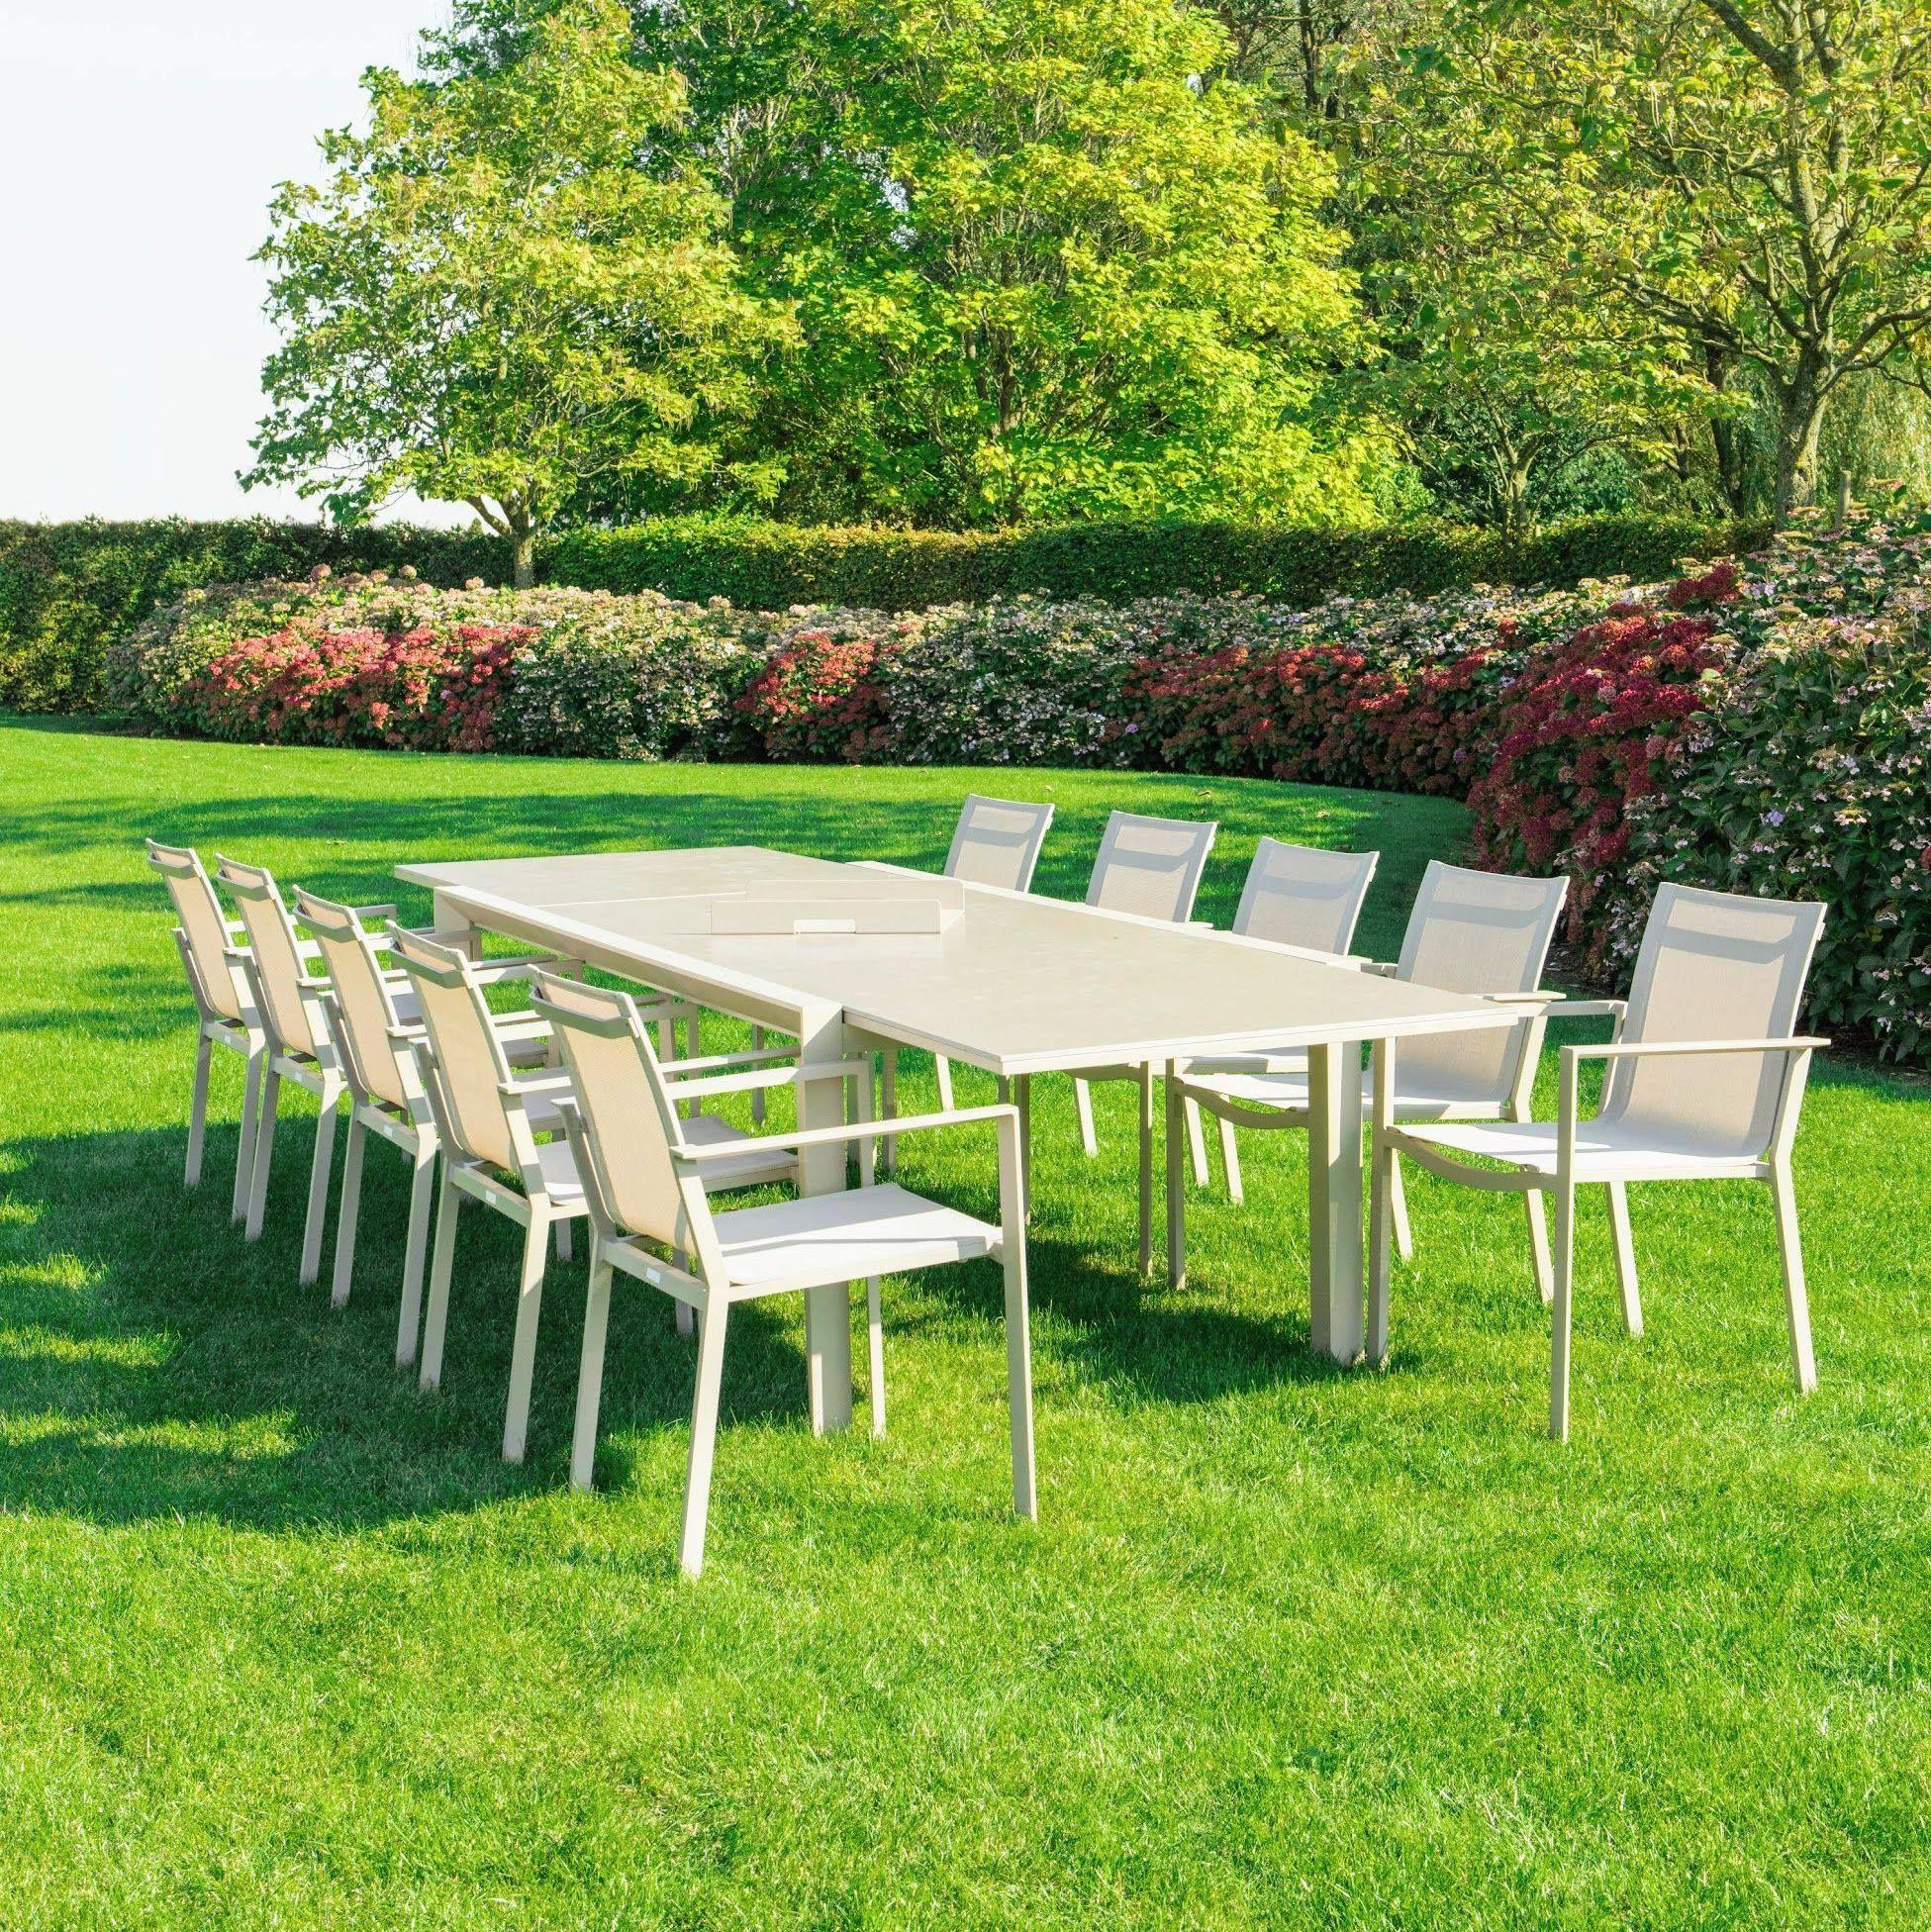 Extension Patio Table Aluminum Patio Outdoor Furniture Sets